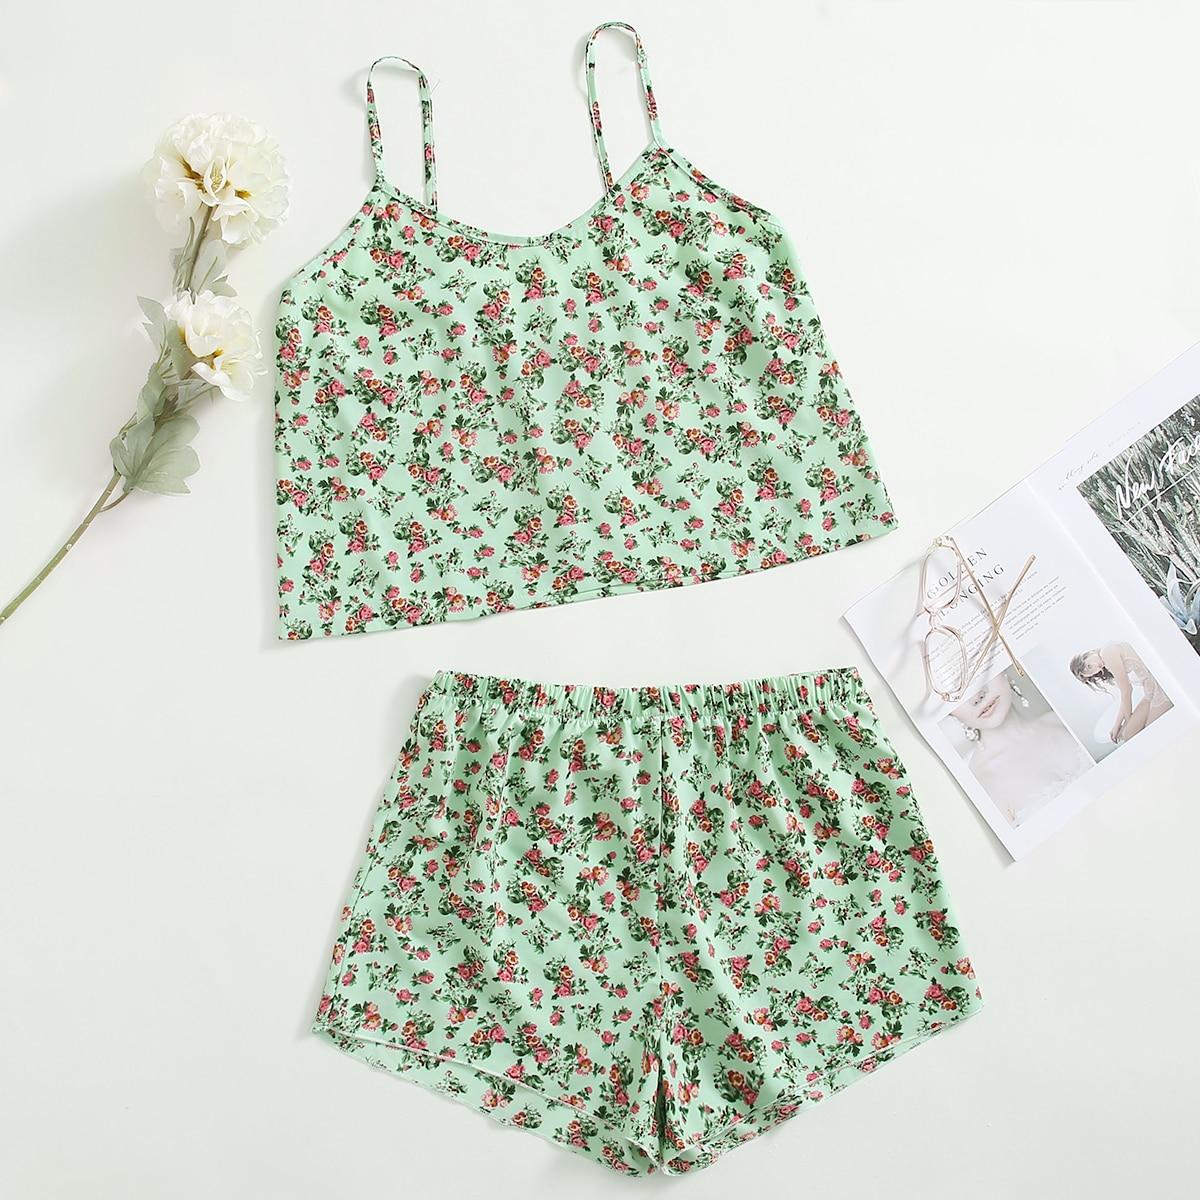 SHEIN Casual Bloemen Grote maten pyjama sets